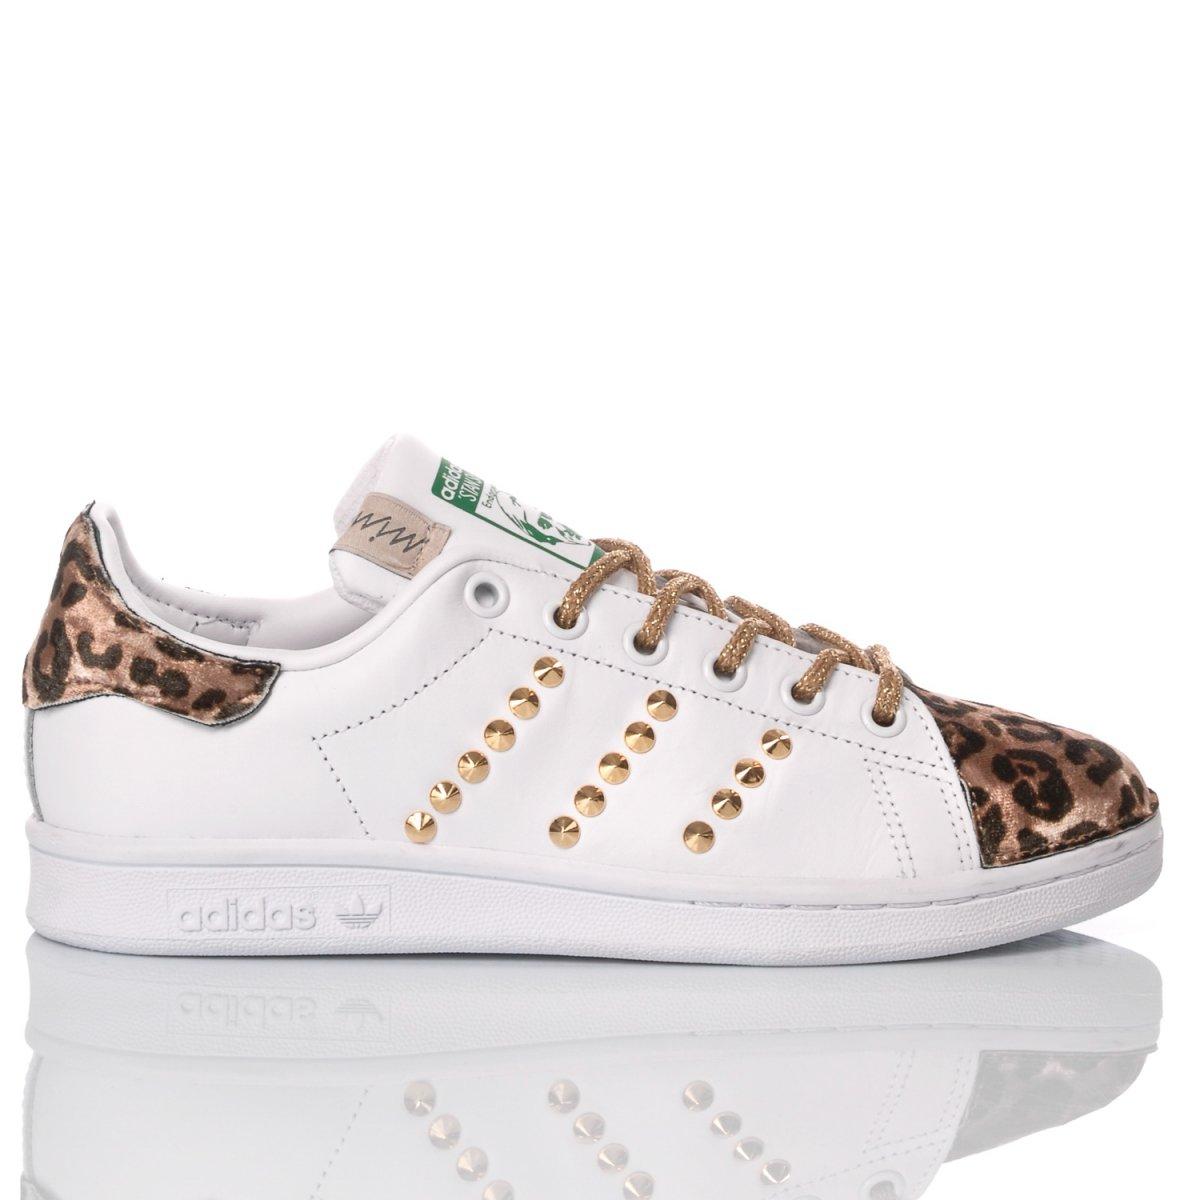 Adidas Stan Smith Street Leo Gold